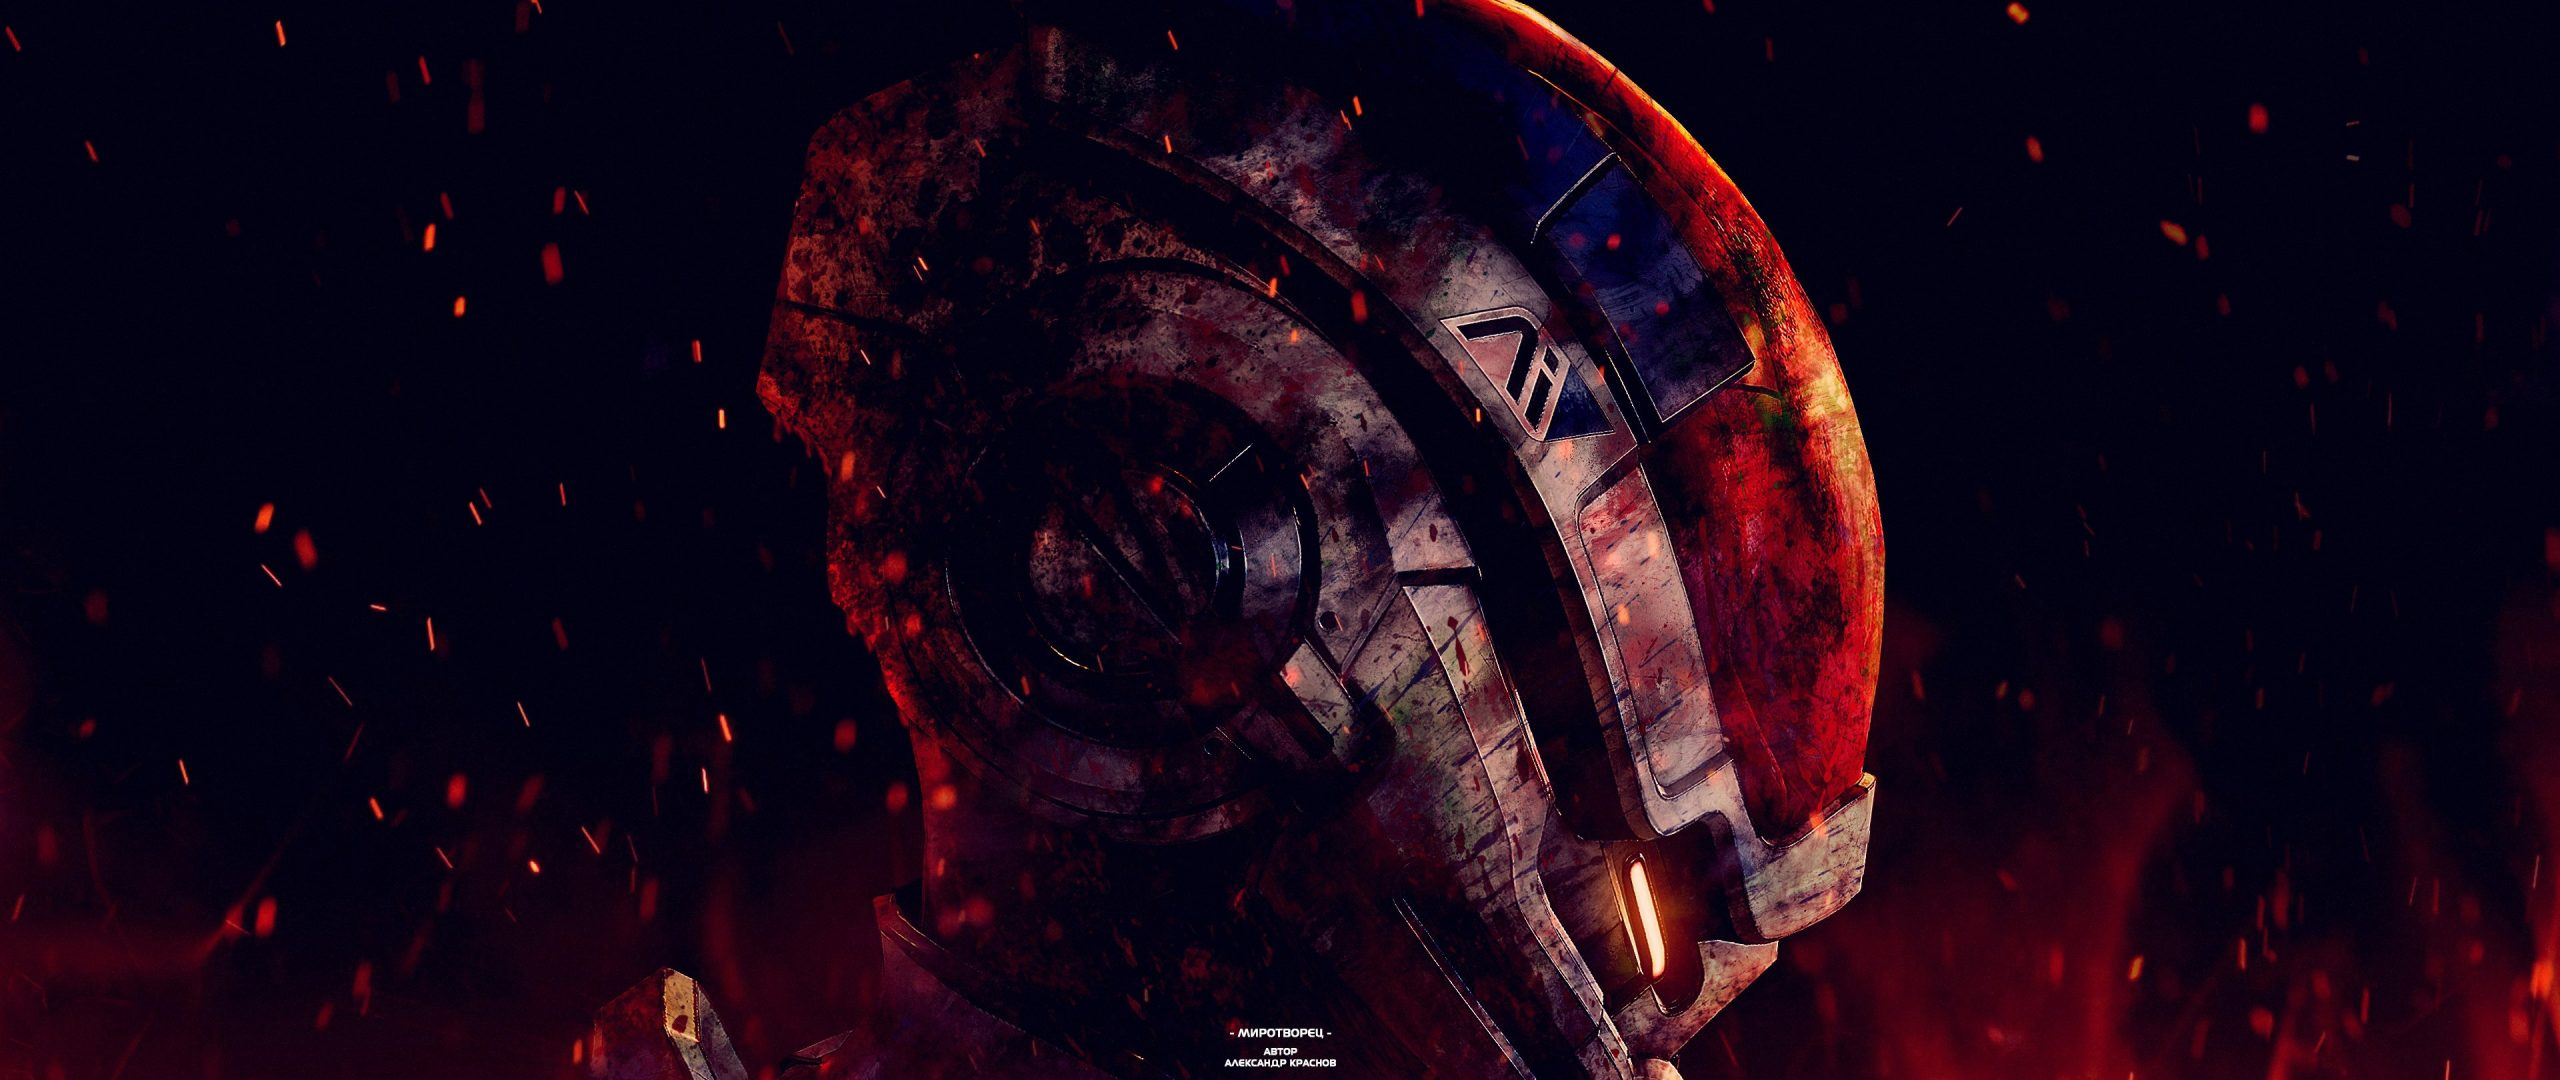 Mass Effect Andromeda Game 4k Wallpaper Best Wallpapers